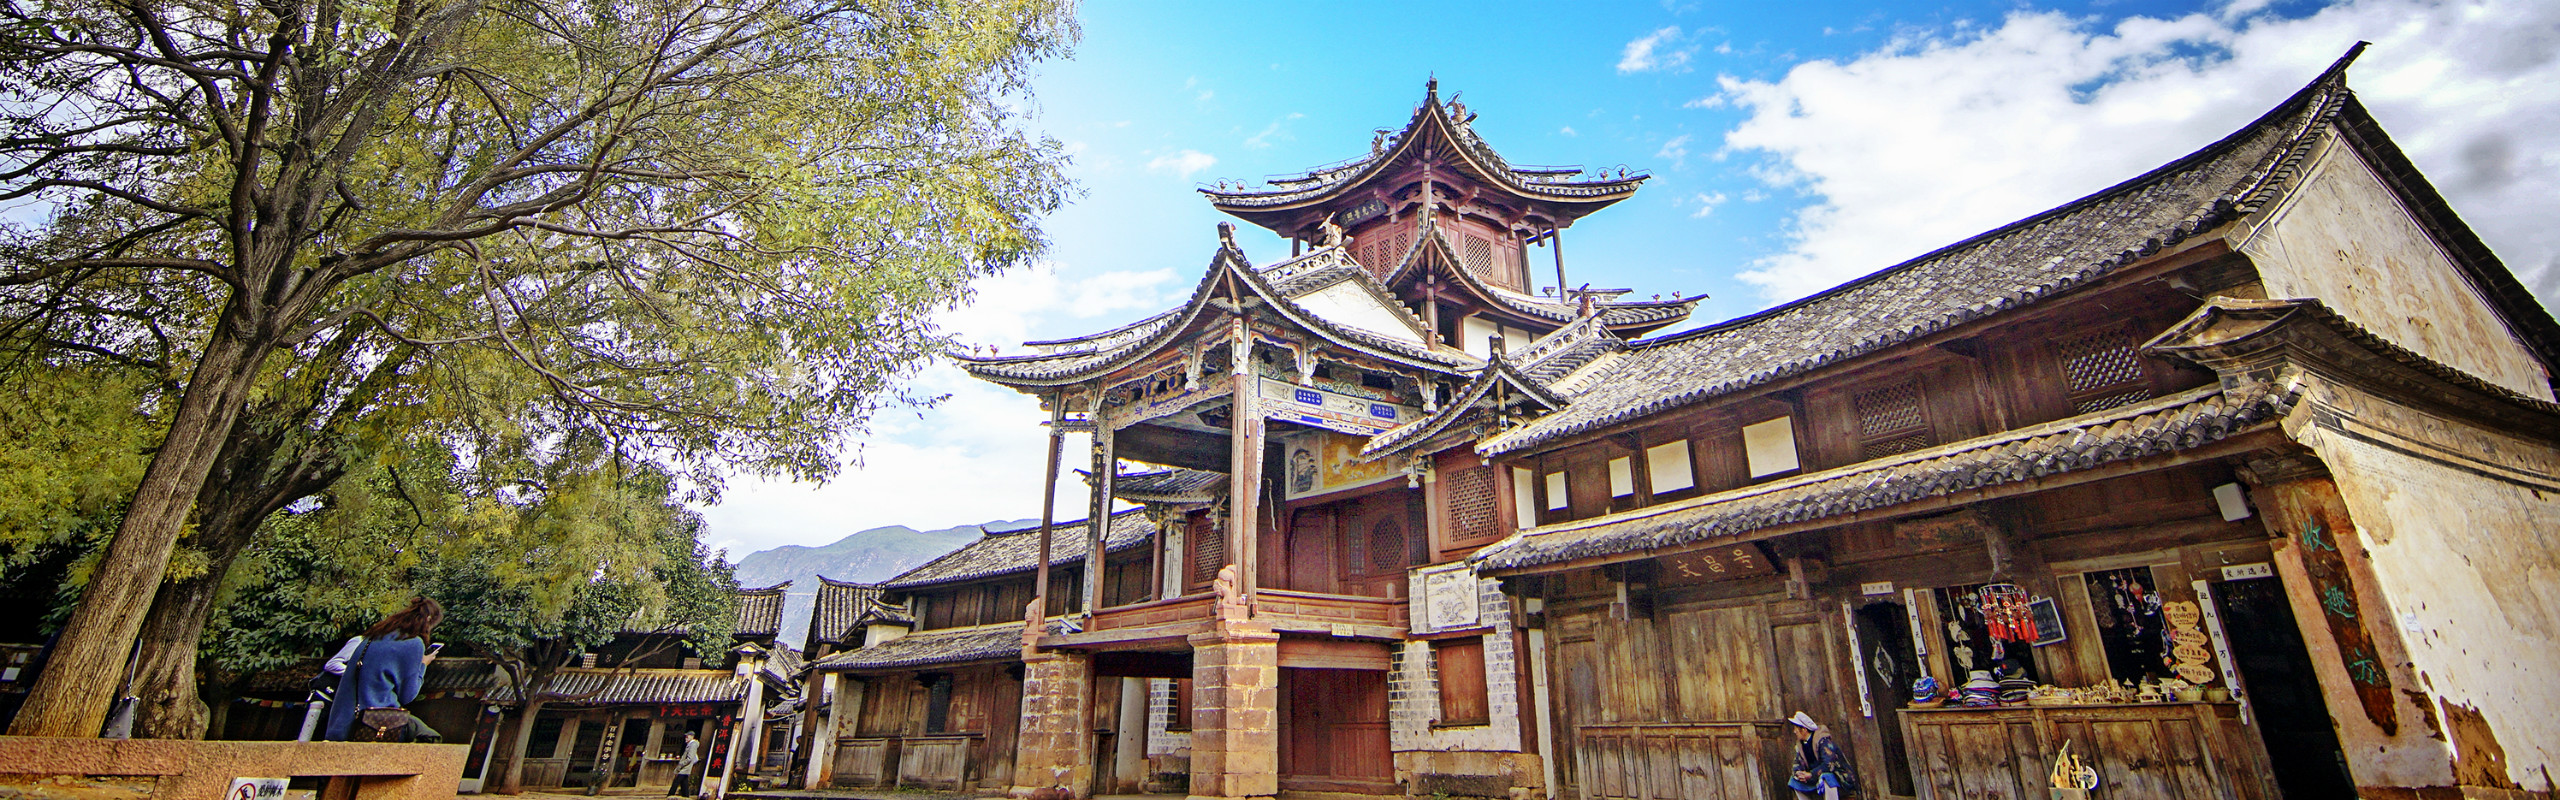 Yunnan Tours - Kunming, Dali, Lijiang, Shangri-la and more!